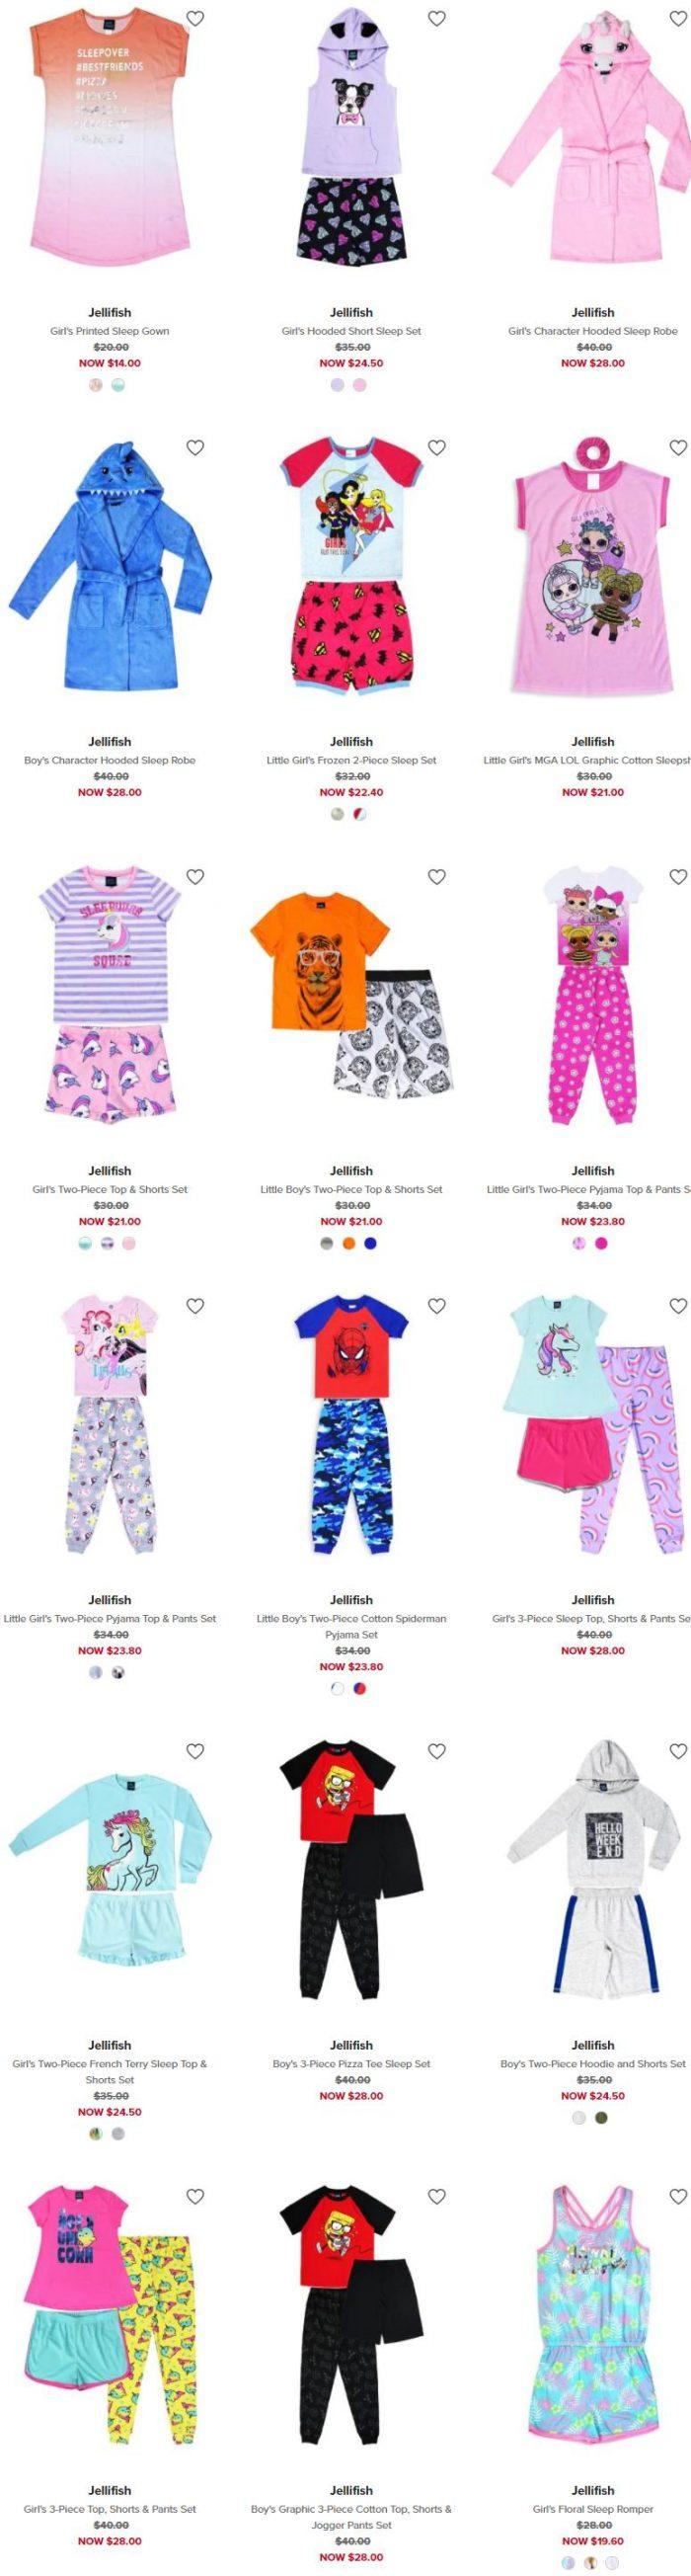 Jellifish超萌儿童睡衣 、睡衣套装 7折+额外7.5折优惠!折后低至 10.5加元!